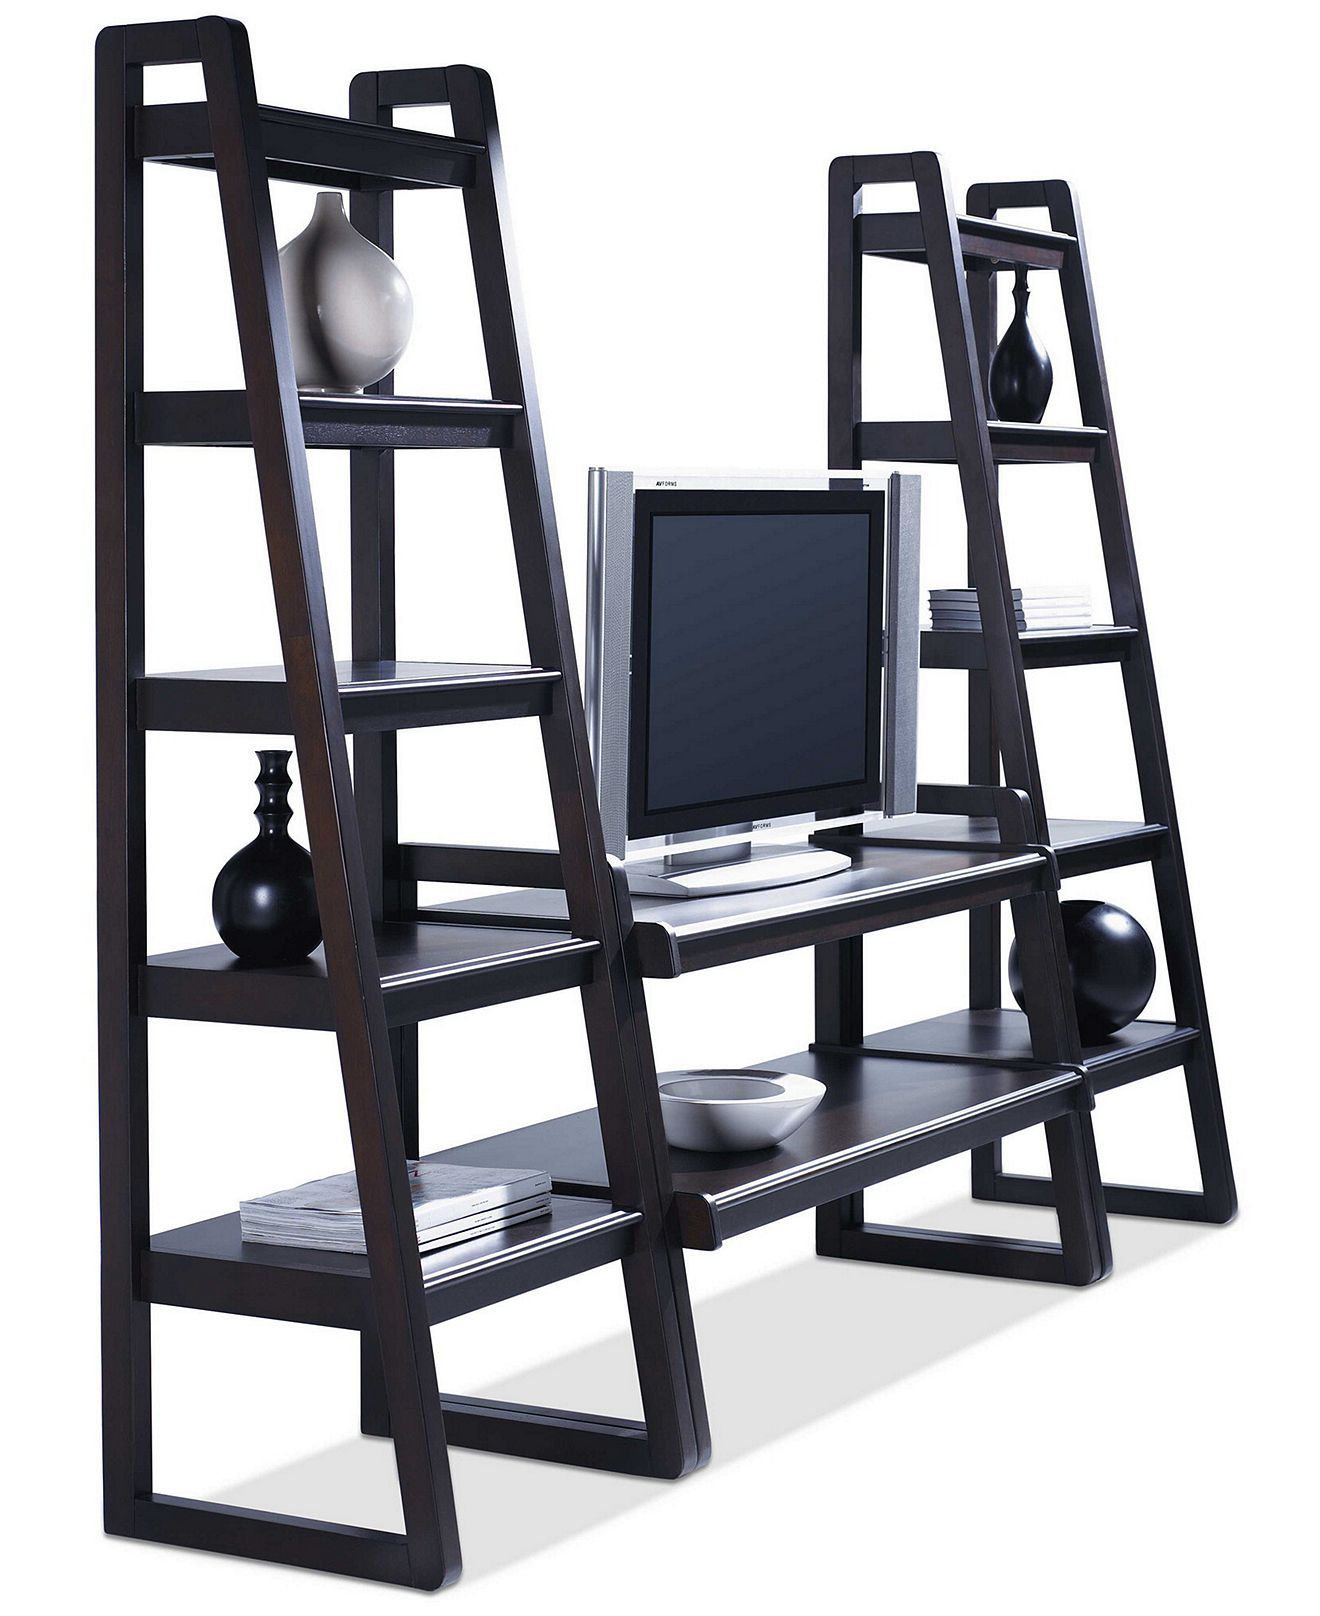 Metro 3-Piece Entertainment Center - Media Storage Furniture - furniture - Macy's